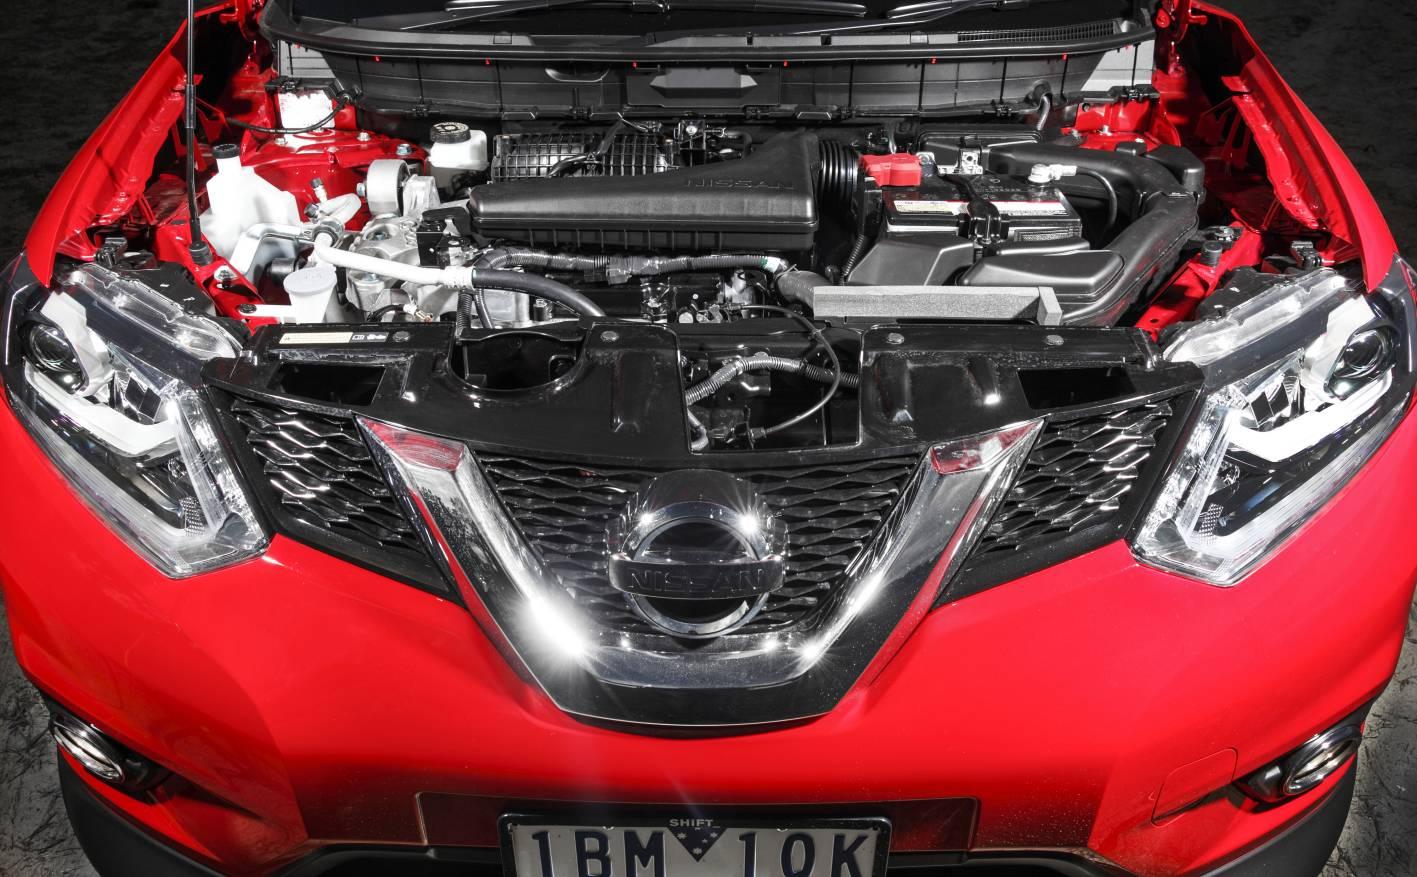 2014 Nissan X Trail Engine Bay